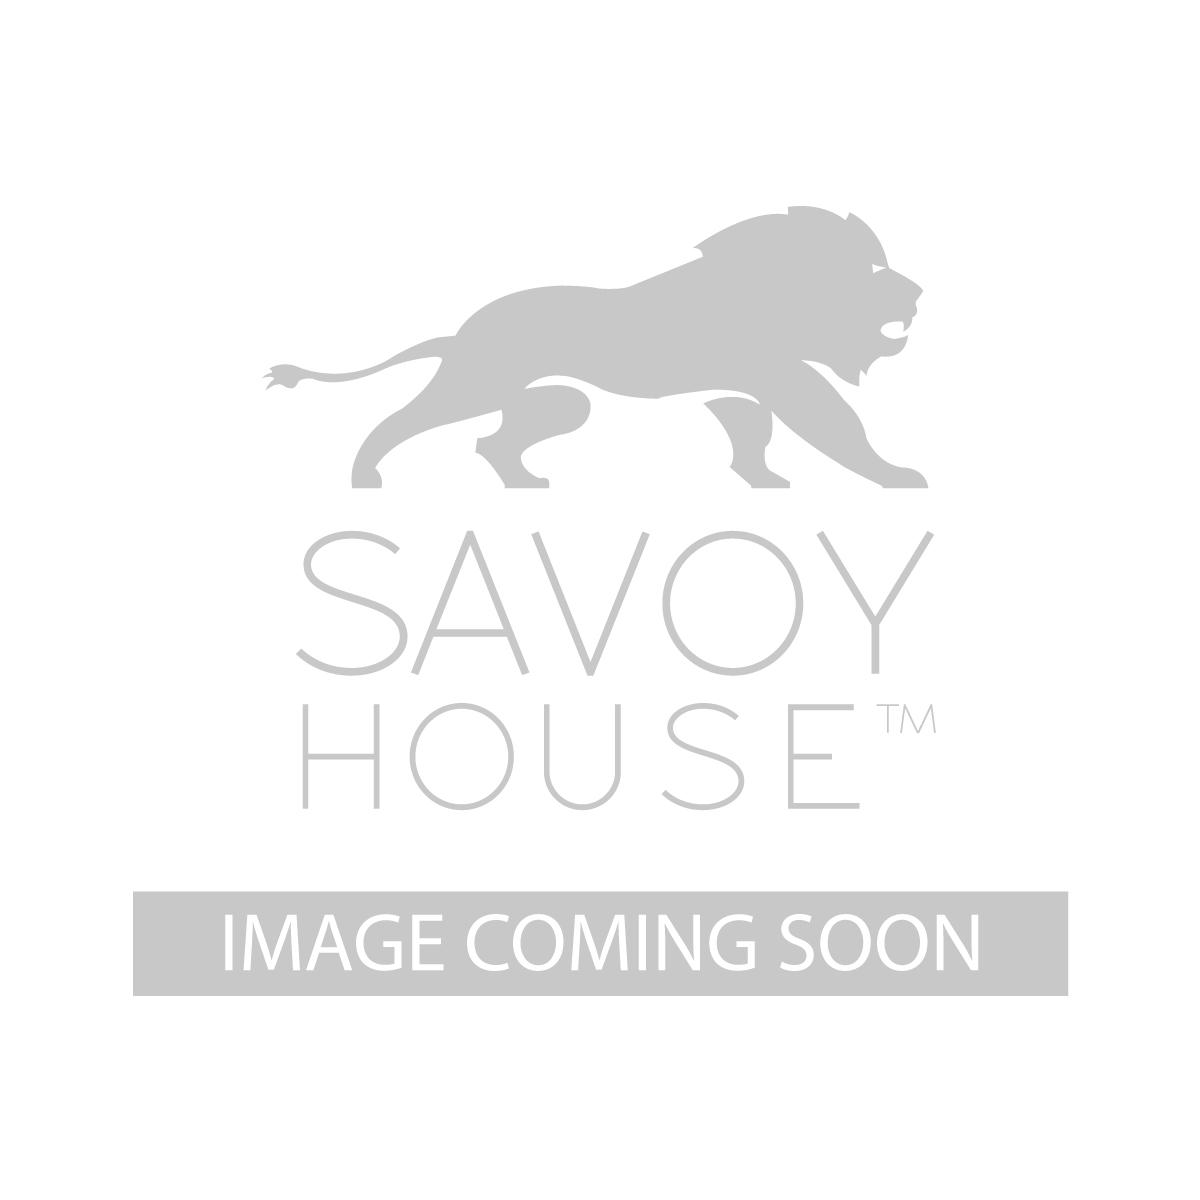 5 5631 Ds 13 Dunston Dark Sky Wall Mount Lantern By Savoy